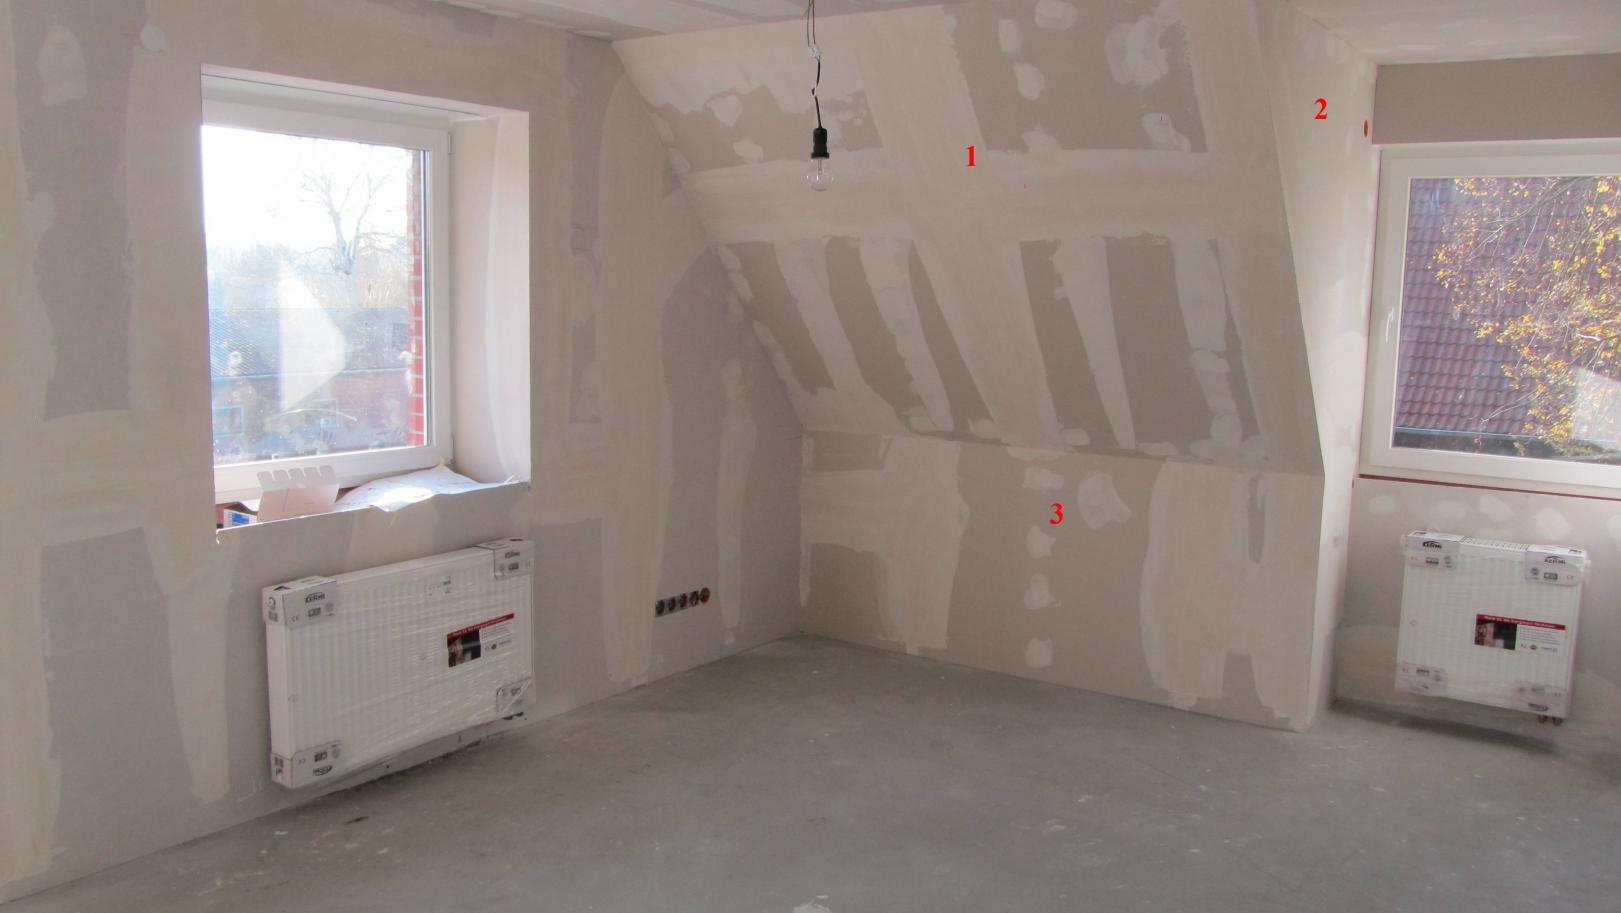 wie tapeziert man top wie tapeziert man with wie tapeziert man wie kann man den bei tapeten. Black Bedroom Furniture Sets. Home Design Ideas